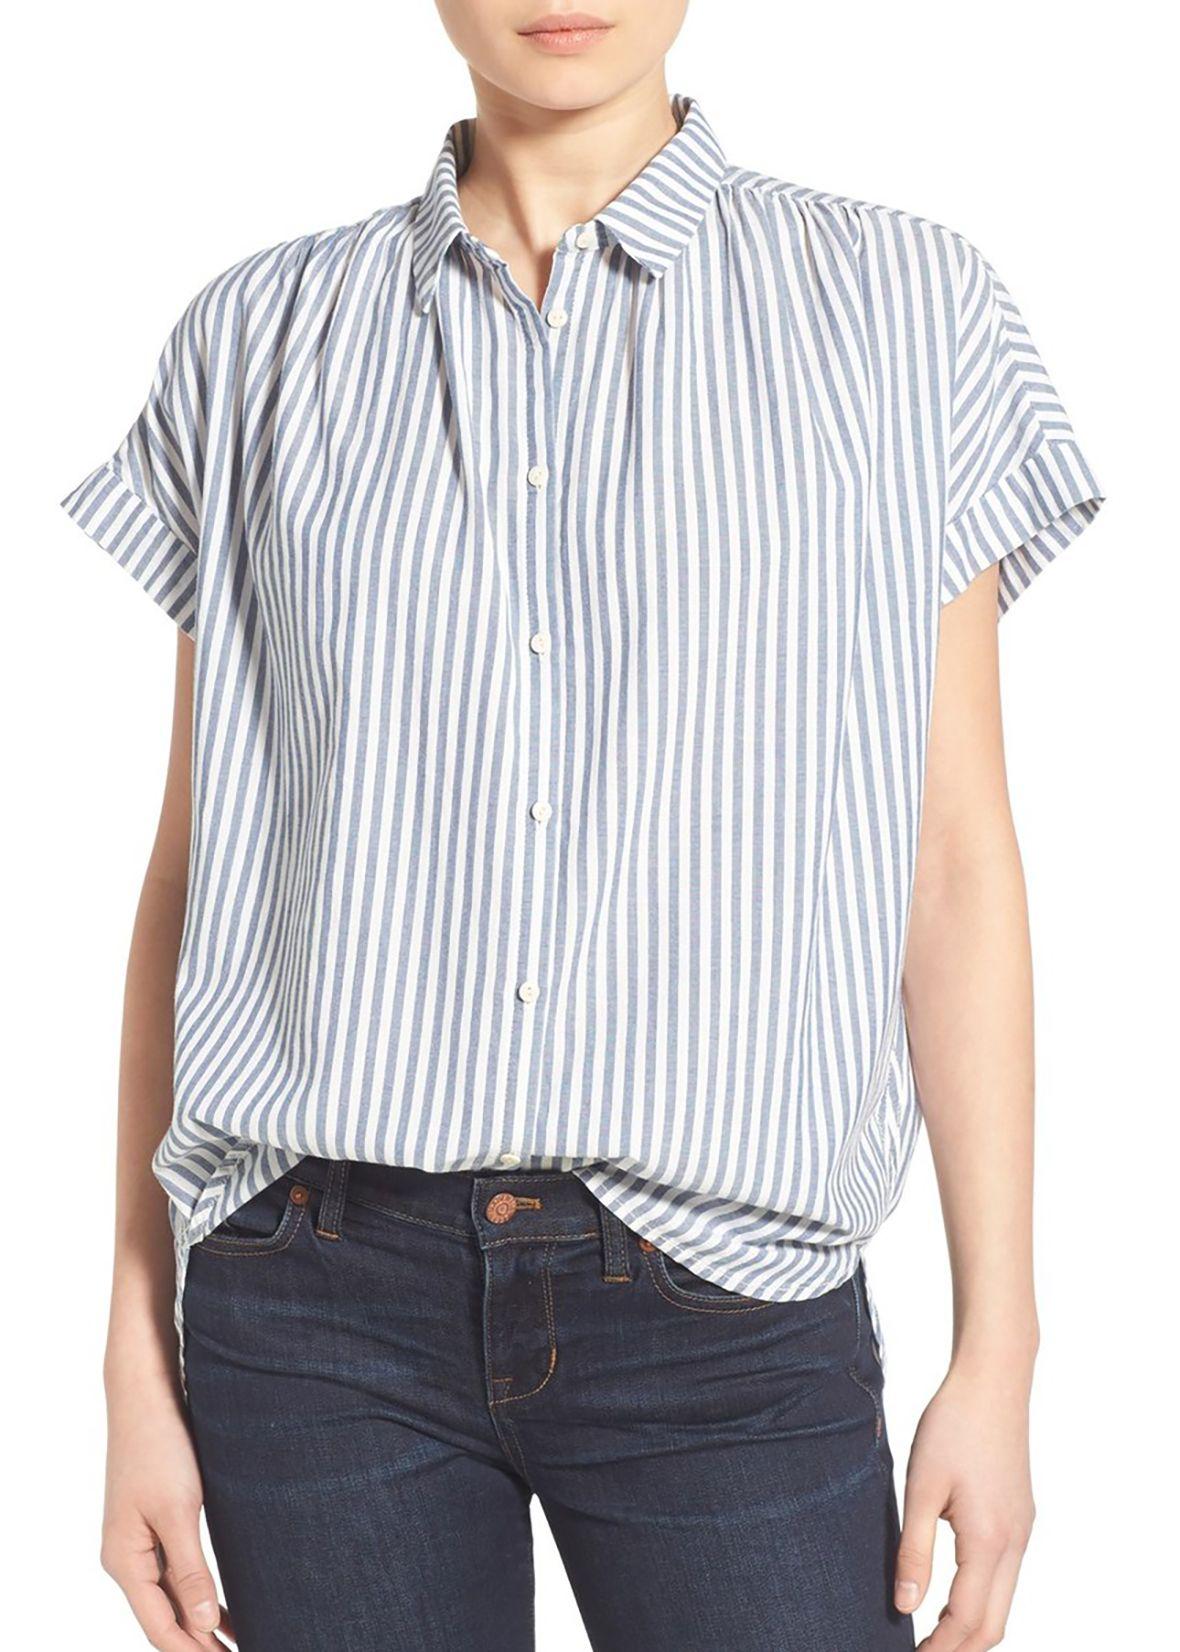 'Central' Stripe Cotton Shirt